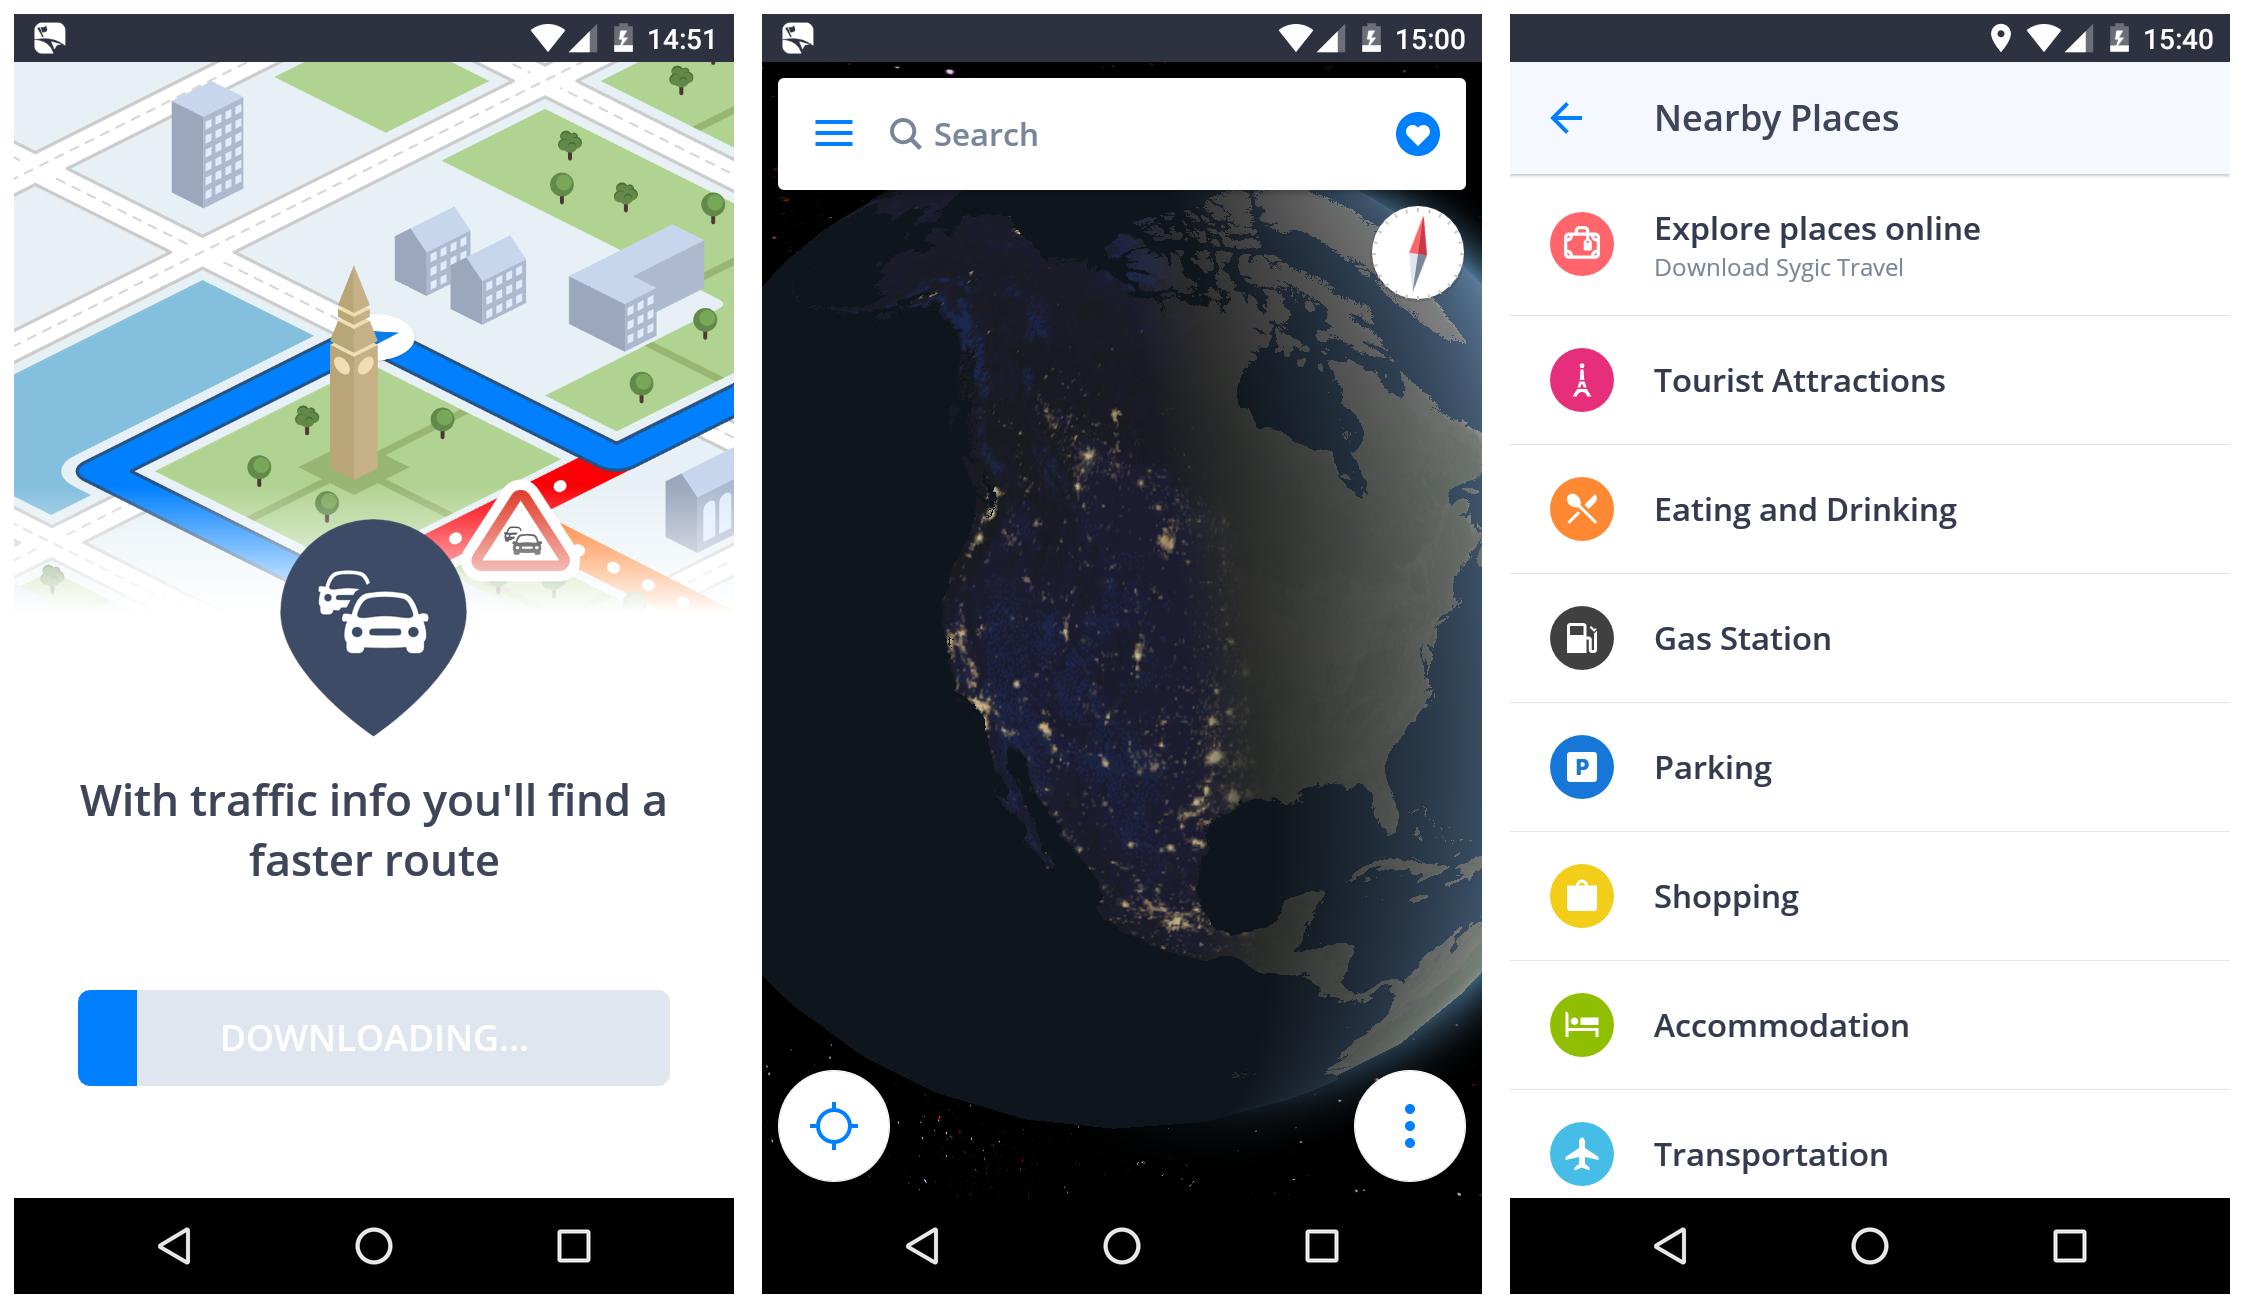 Sygic Us Map Android Download Sygic Us MapsGPS Navigation Maps - Sygic us maps